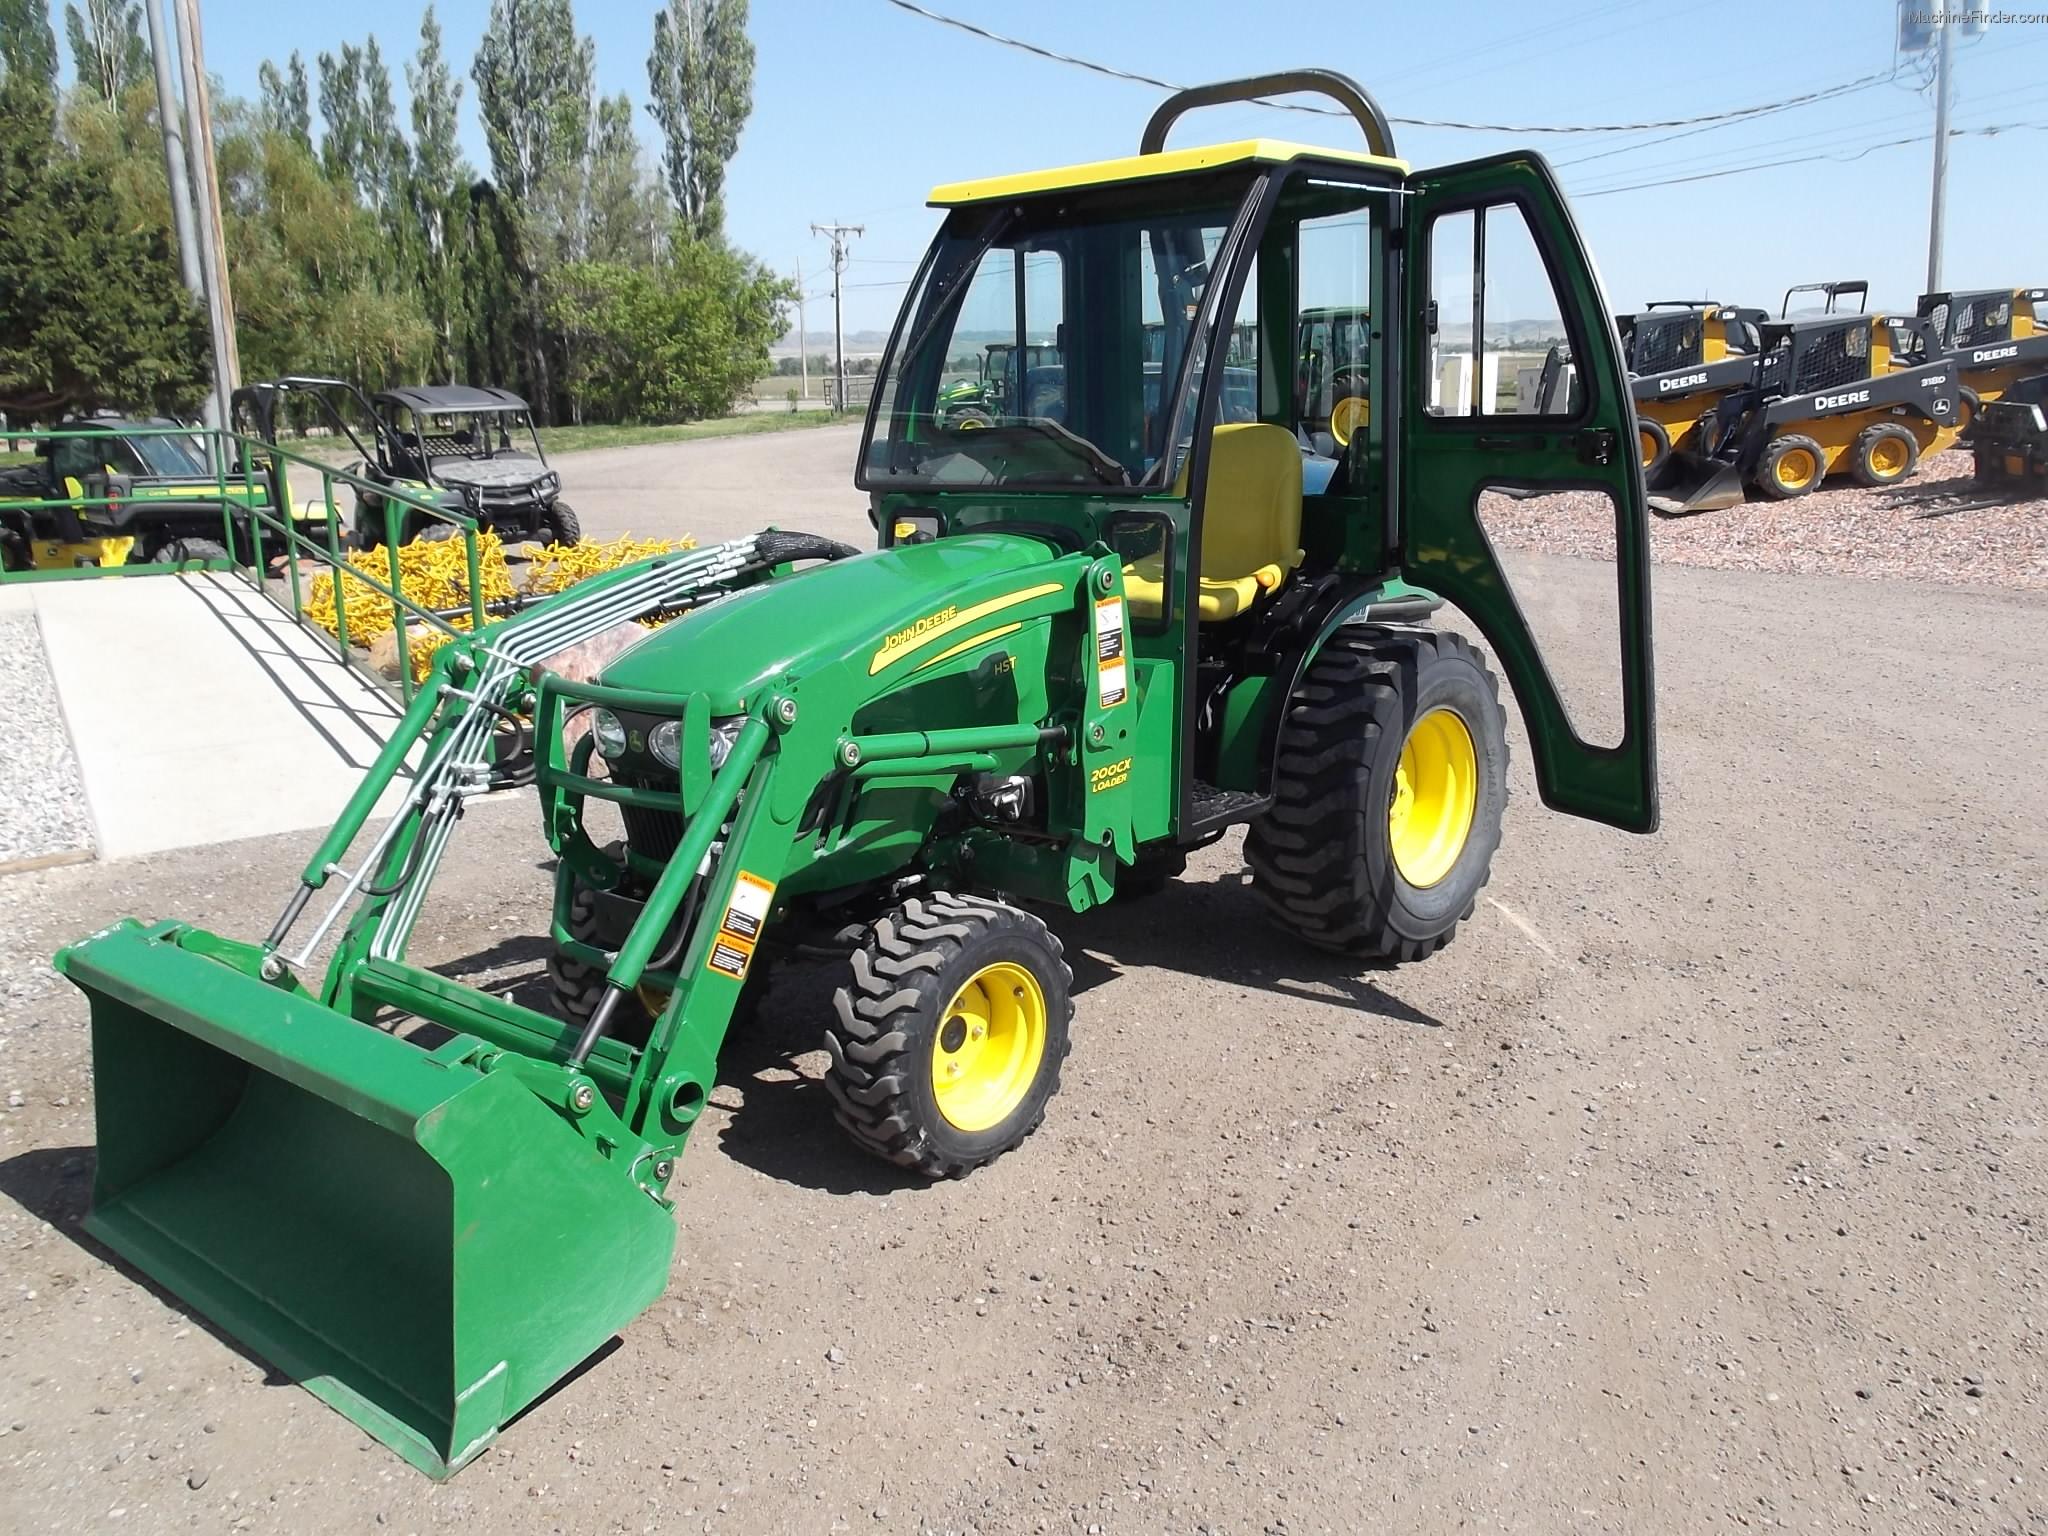 2008 John Deere 2720 Tractors - Compact (1-40hp.) - John ...